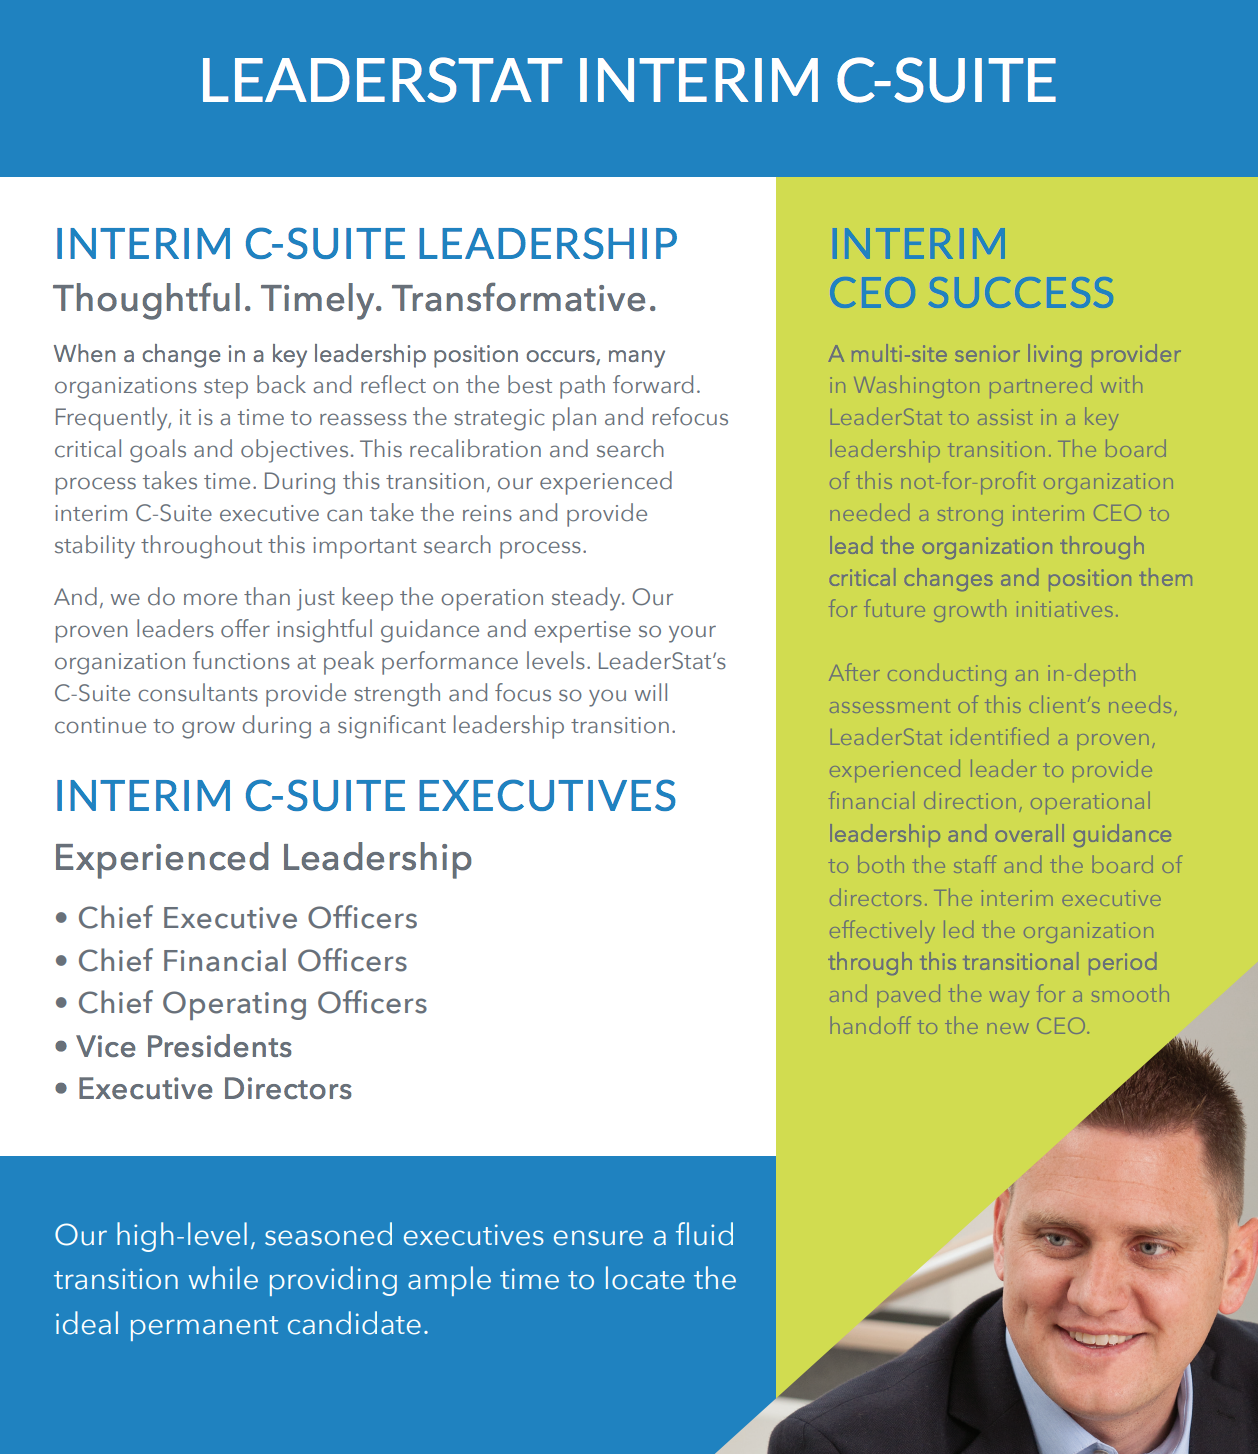 LeaderStat Interim C-Suite Brochure